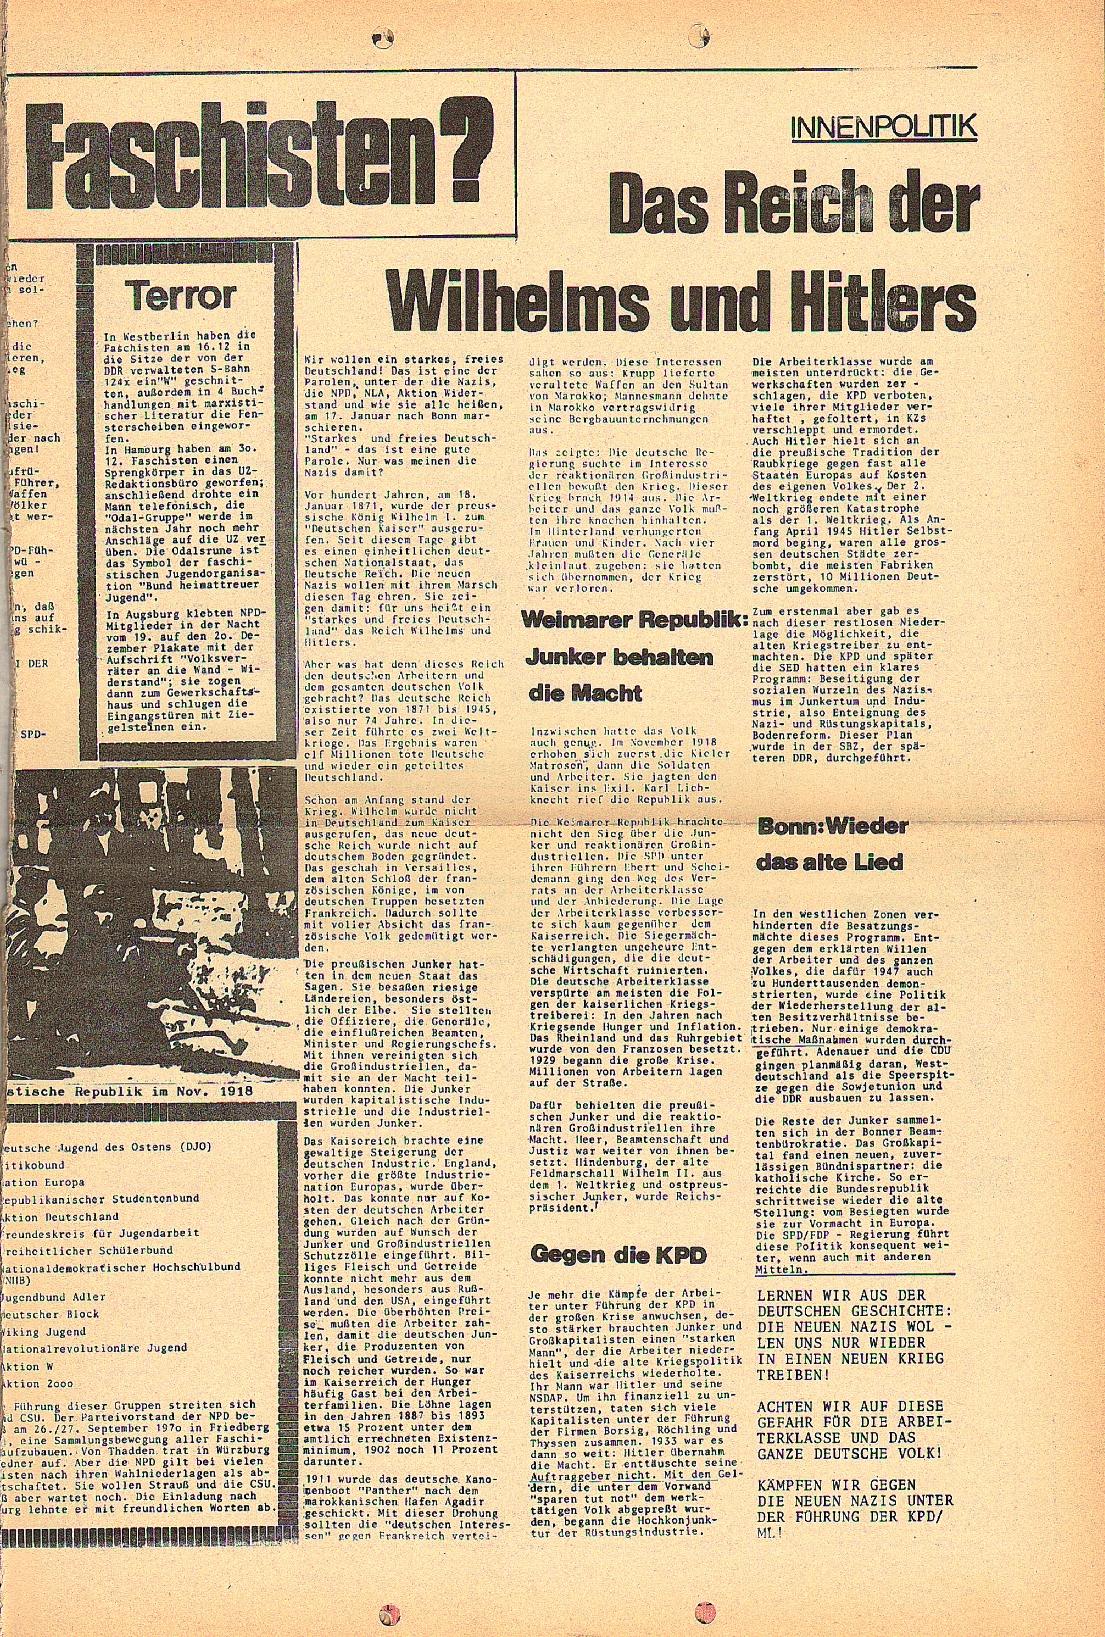 Rote Fahne, 2. Jg., Januar 1971, Extrablatt, Seite 3